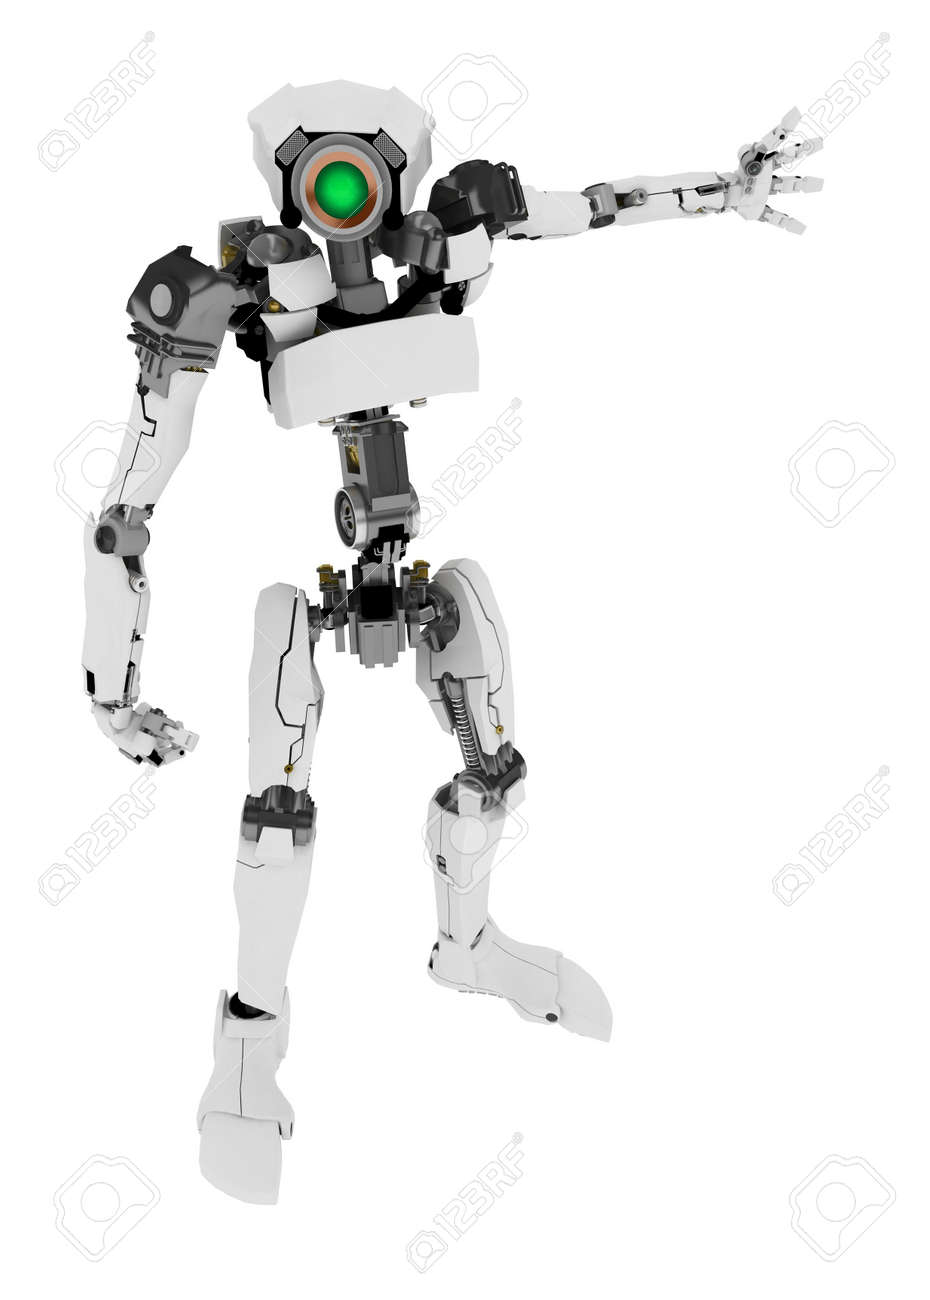 Slim 3d robotic figure, over white, isolated Stock Photo - 3320423